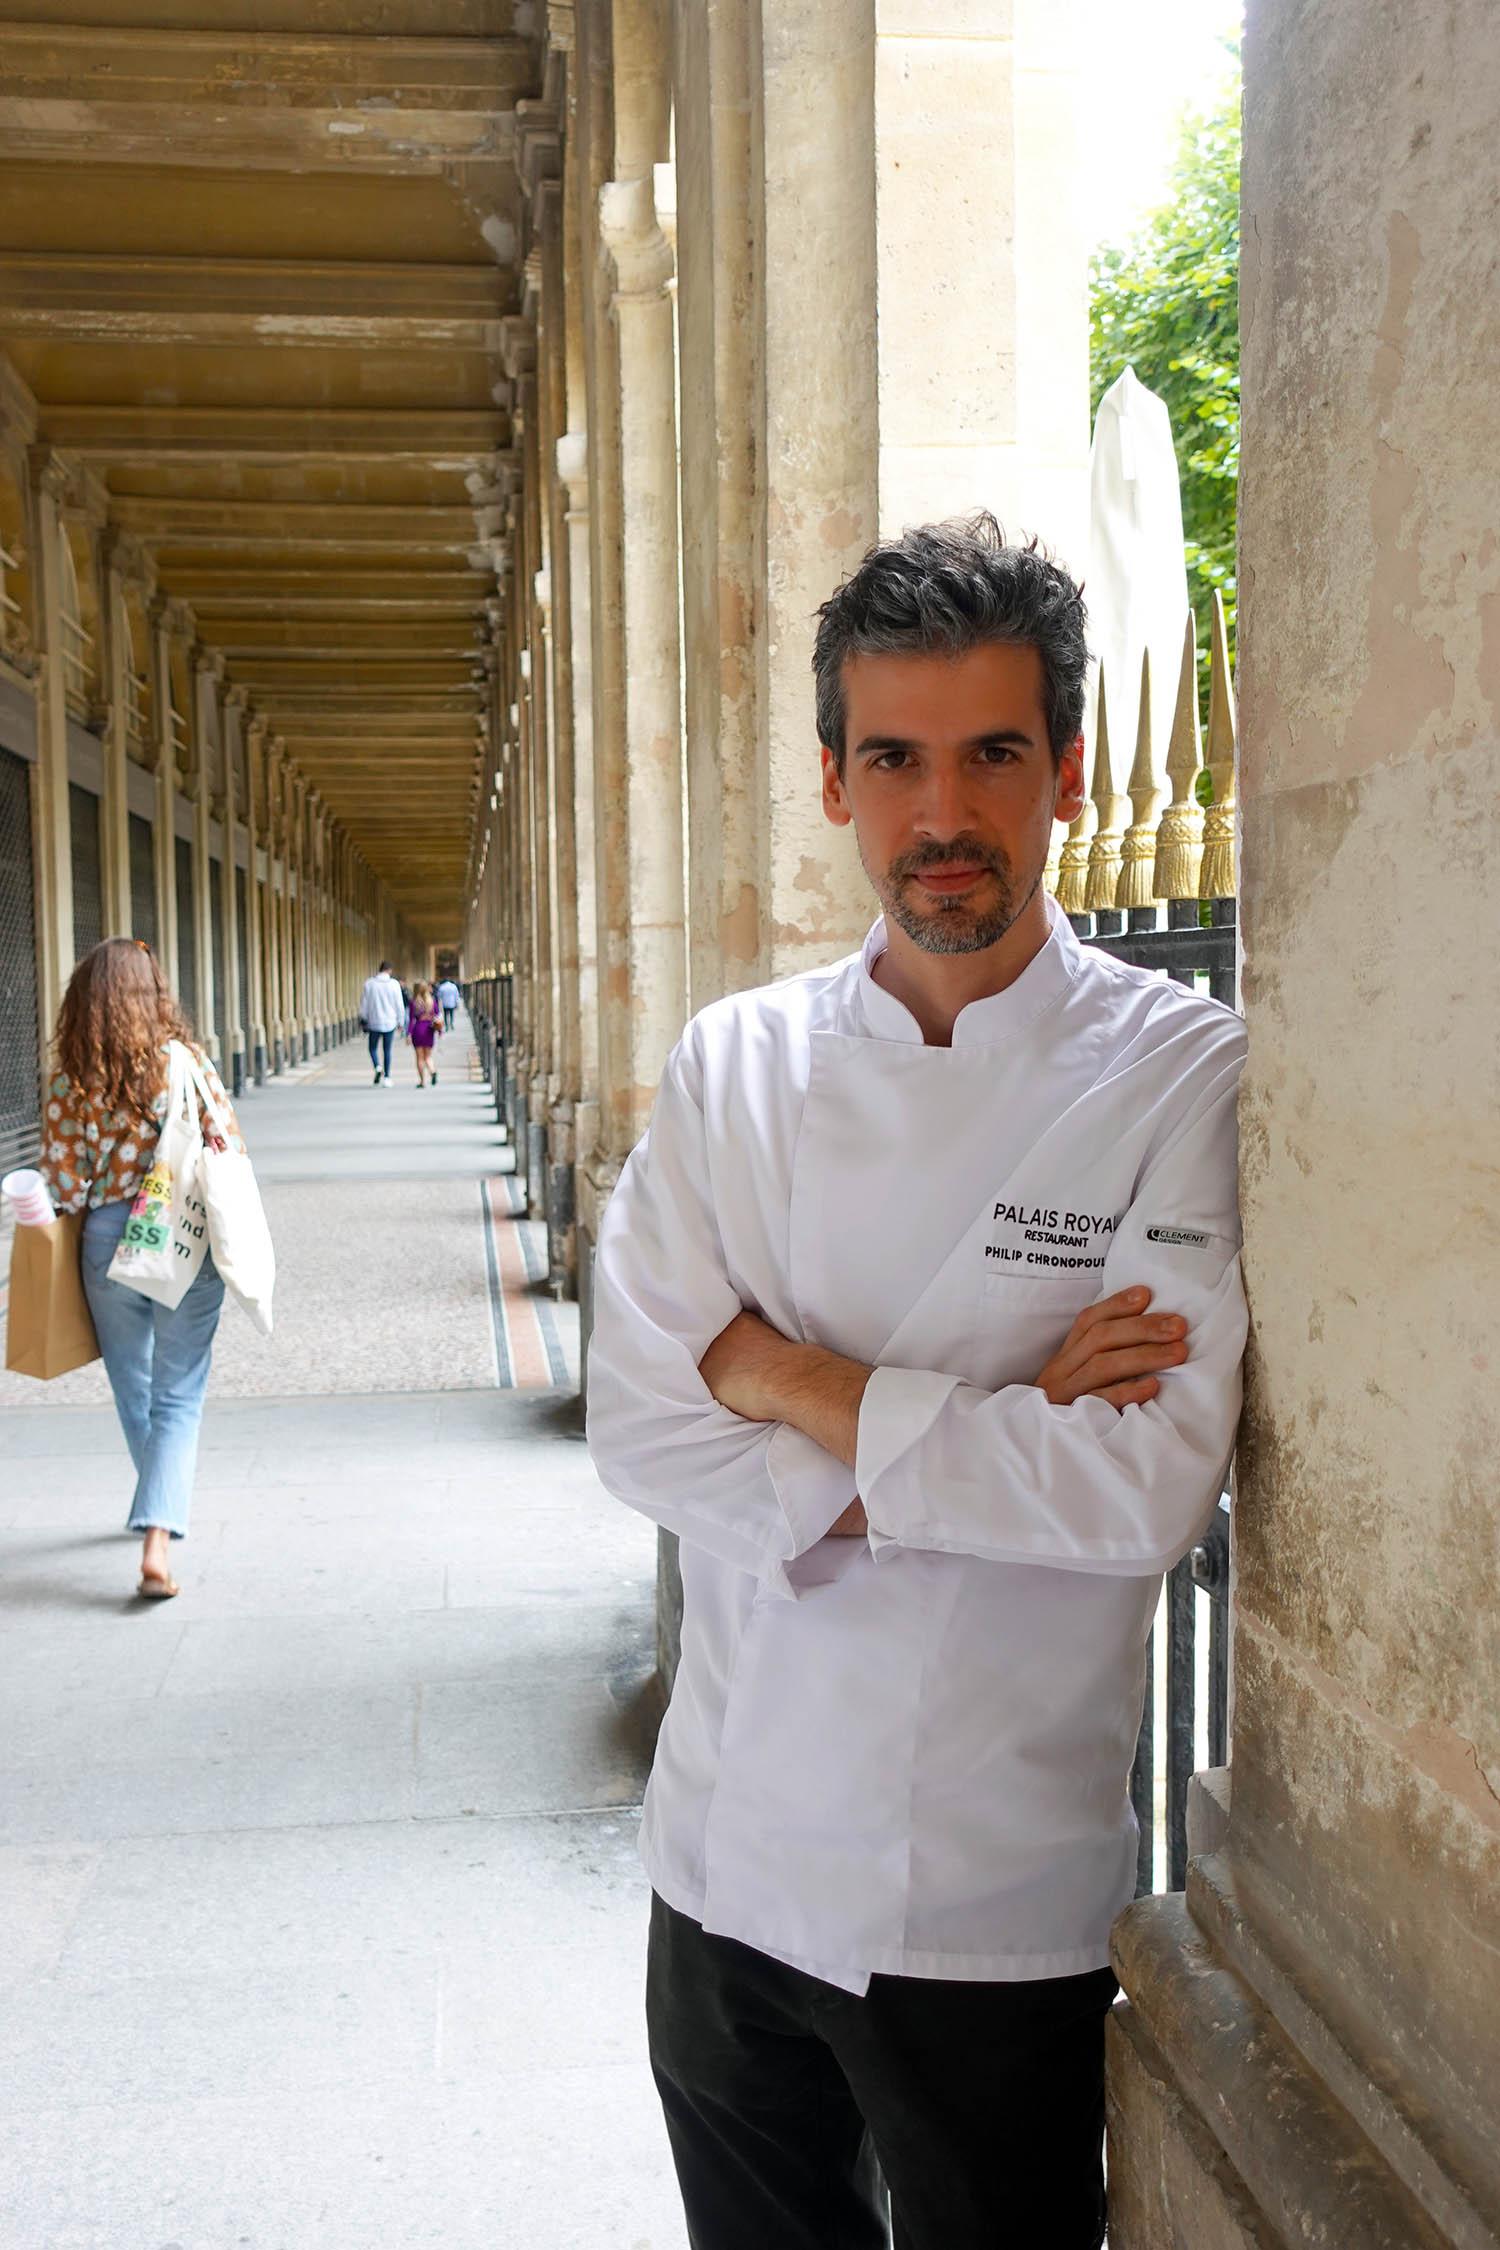 Philip Chronopoulos chef palais royal restaurant